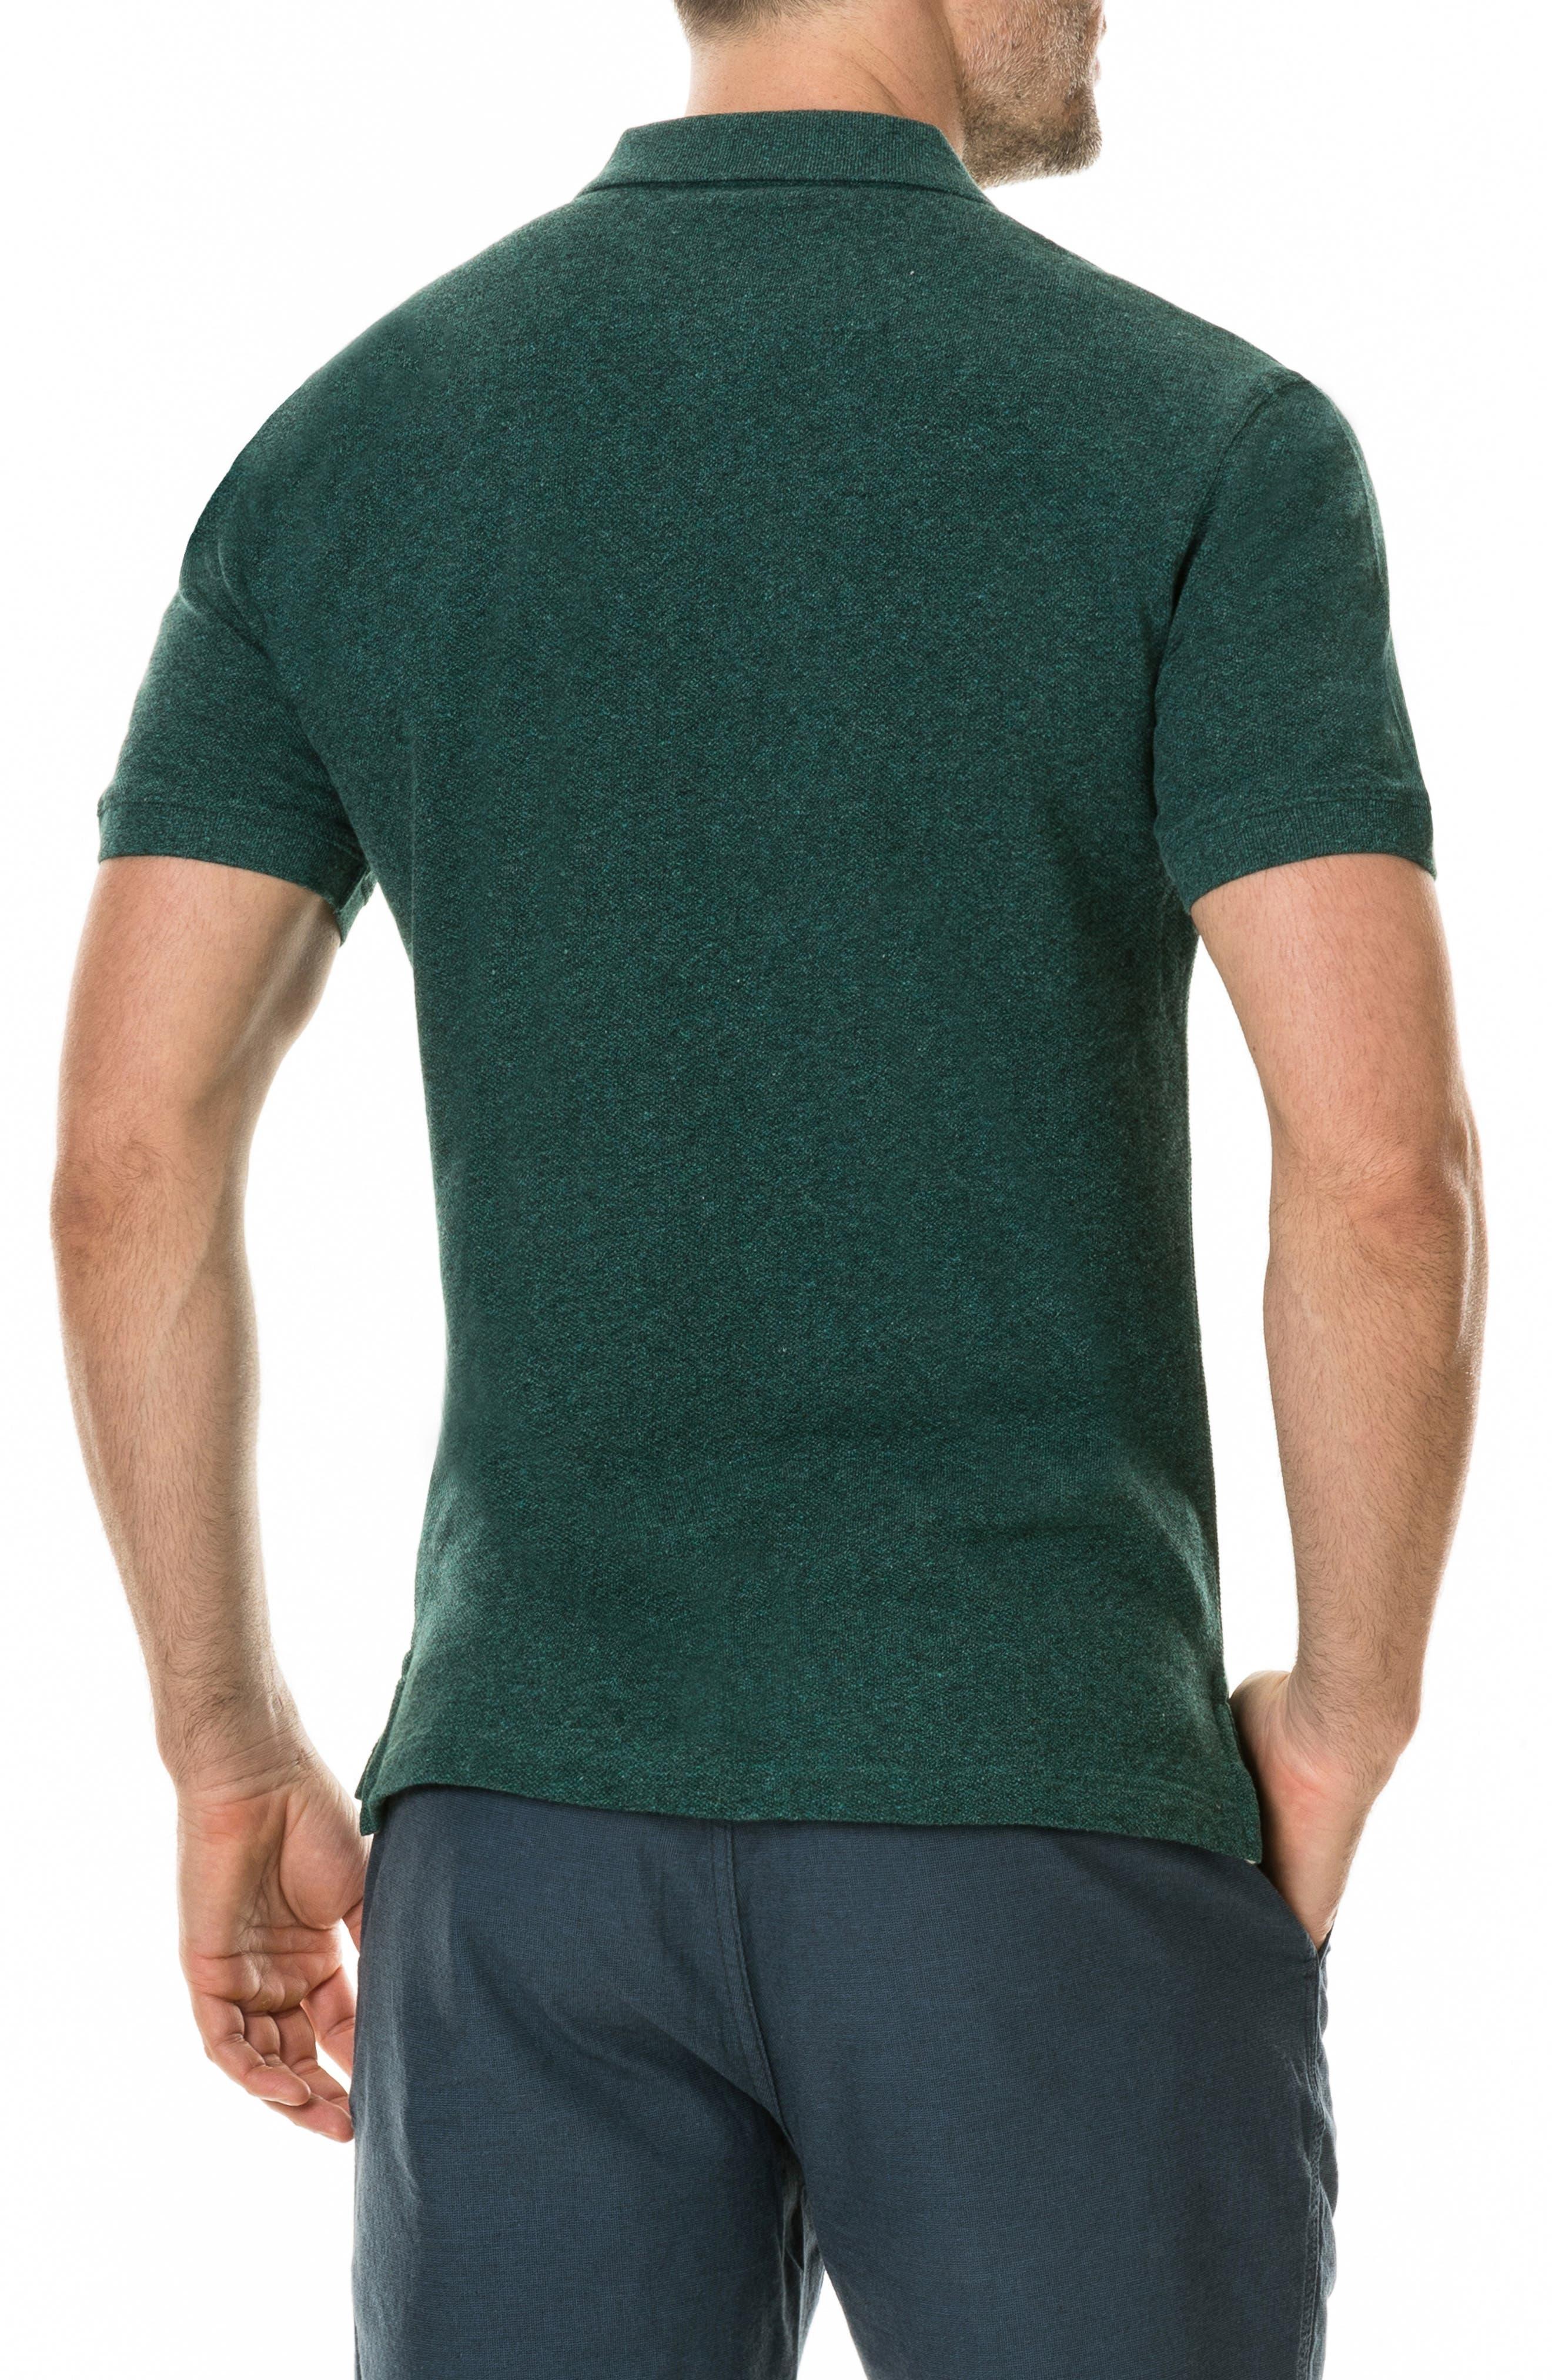 'The Gunn' Piqué Sports Fit Cotton Polo,                             Alternate thumbnail 2, color,                             PINE